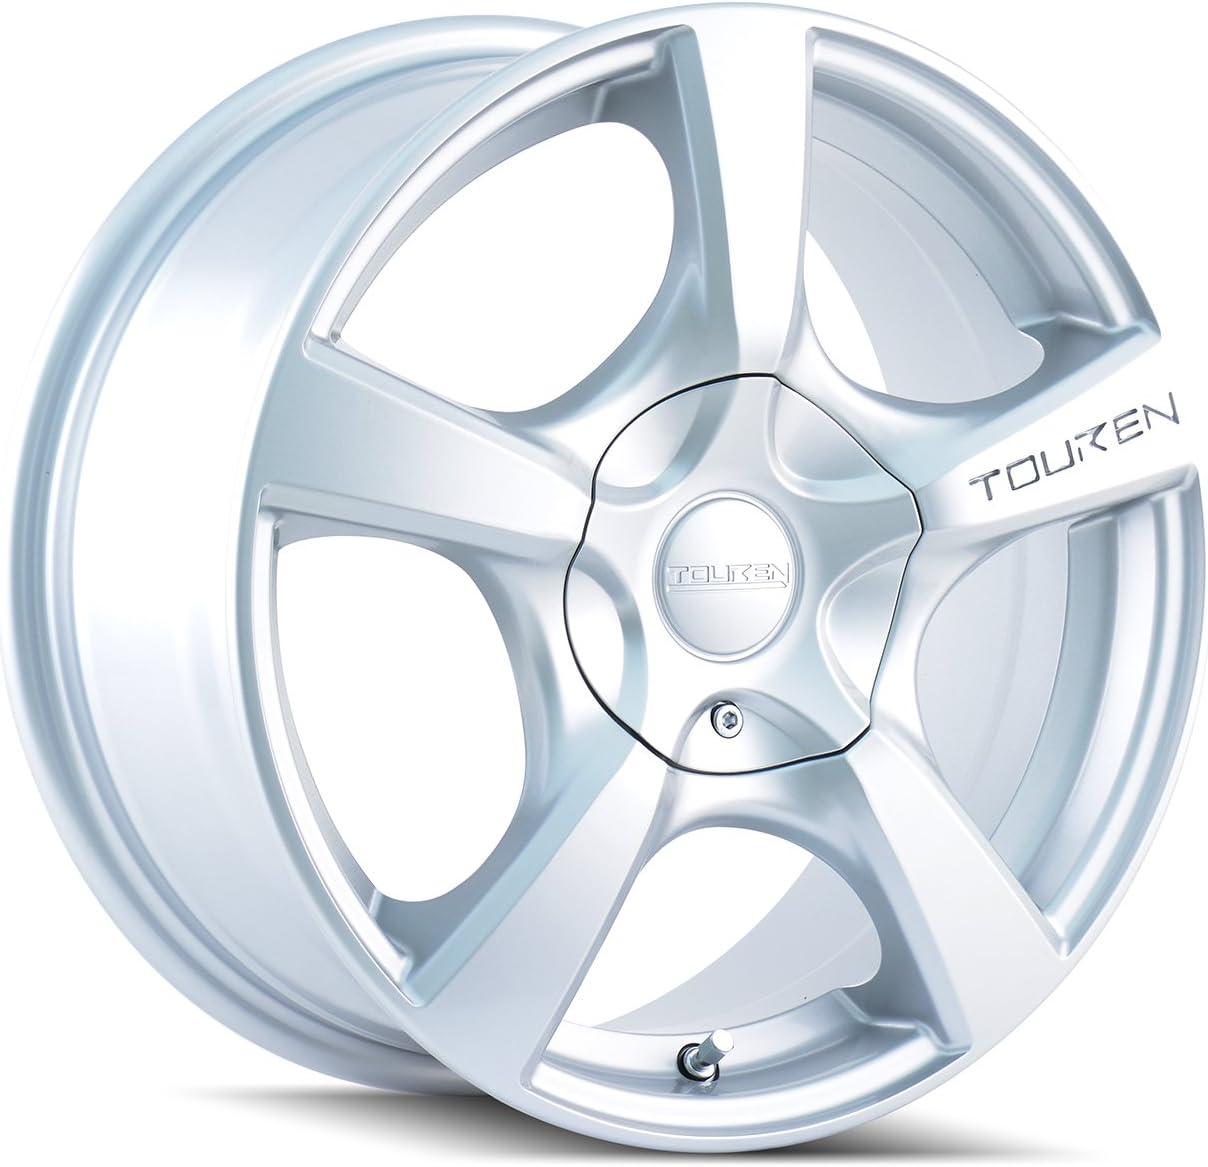 17 x 7. inches //5 x 105 mm, 42 mm Offset BLACK Wheel with Matte TOUREN TR9 3190